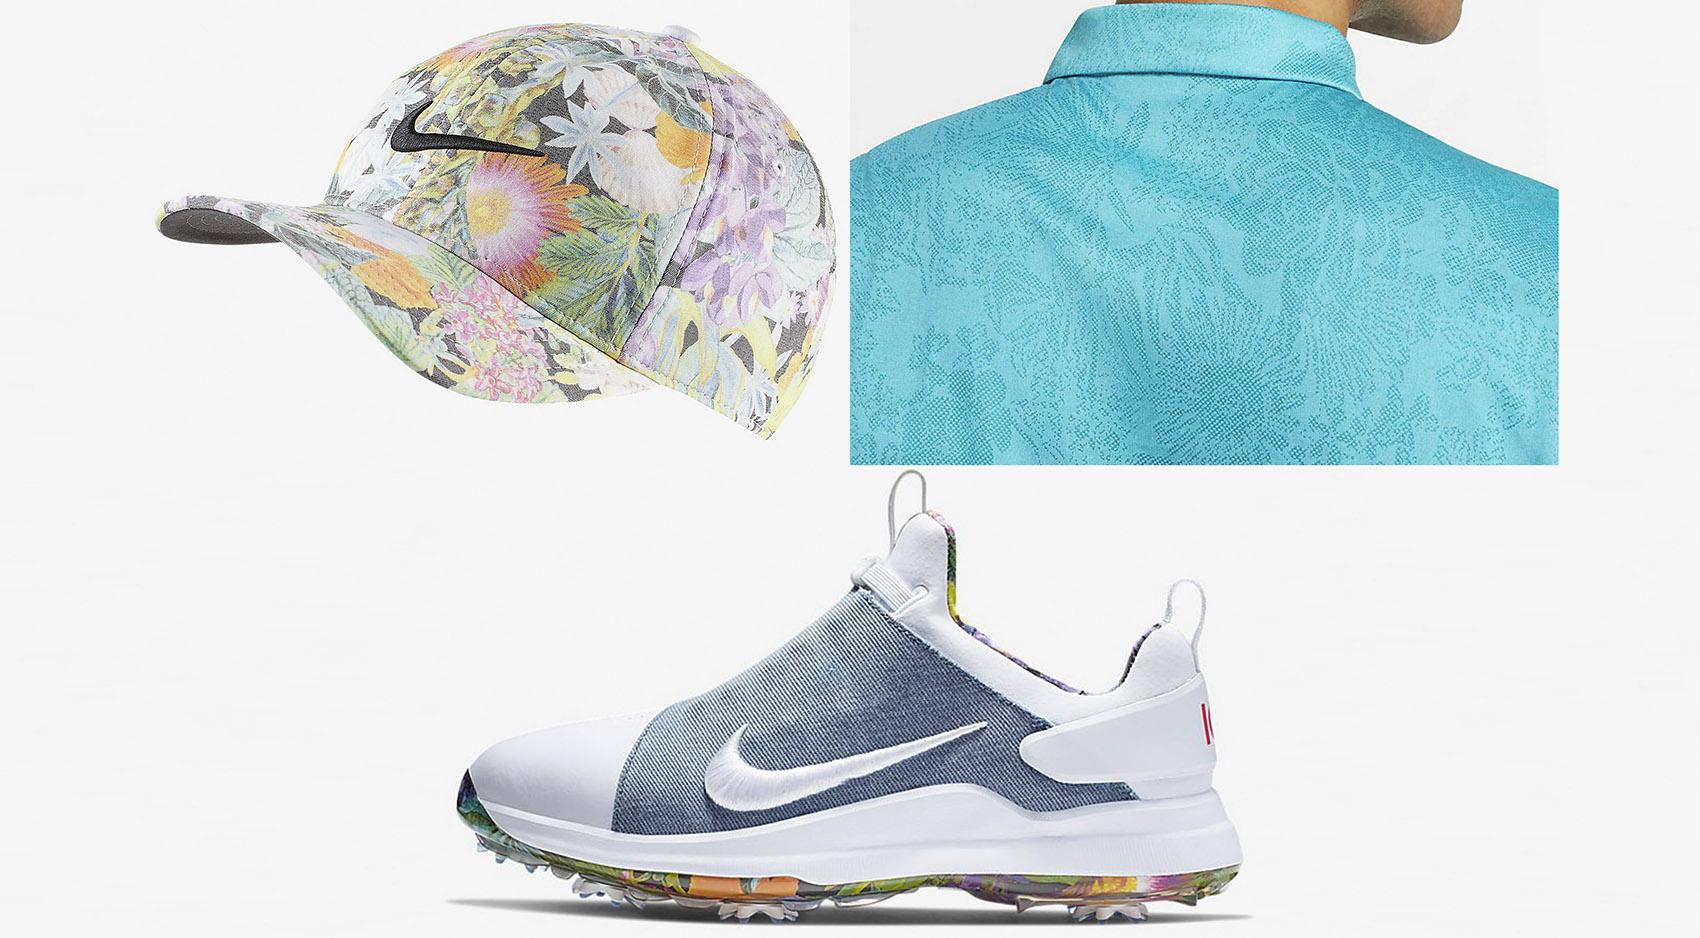 Mens Nike Air Max 2010 20K Running Shoes Grey Red White,nike Free Trainer 7.0,nike Air Max Thea,Fantastic Savings Super Deals